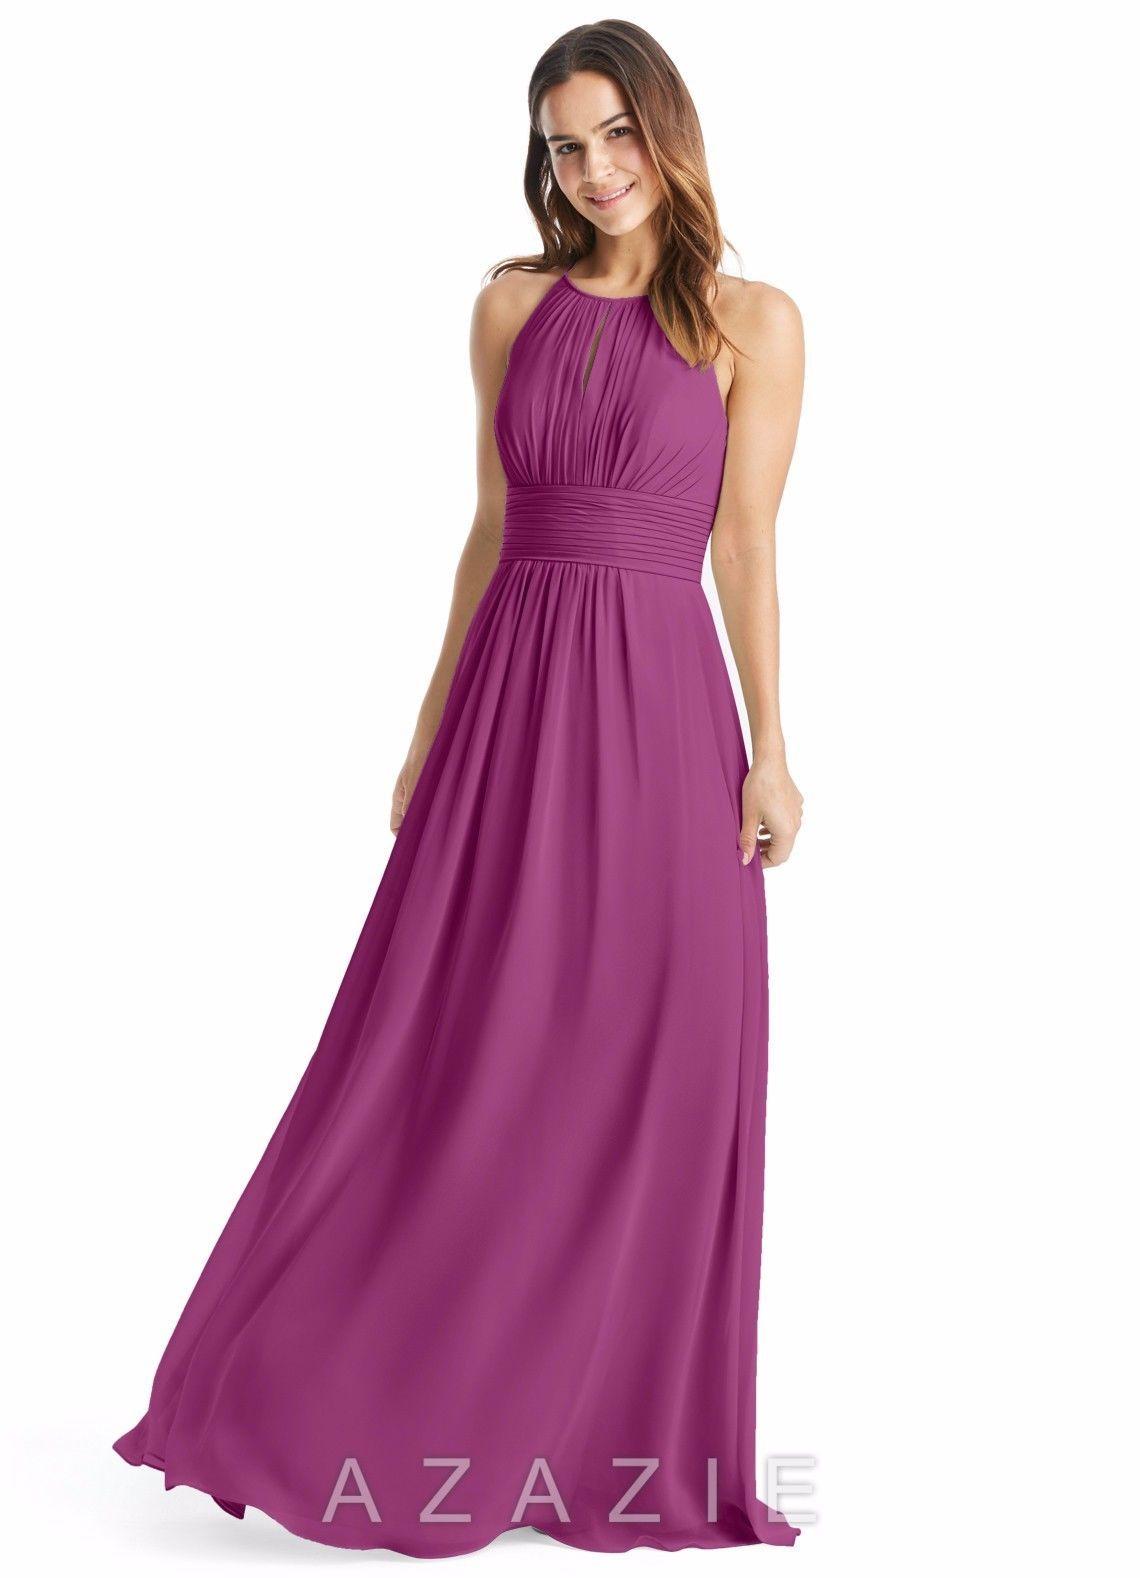 Azazie Bonnie Bride Bridesmaid Formal Prom Orchid Chiffon Dress Size ...